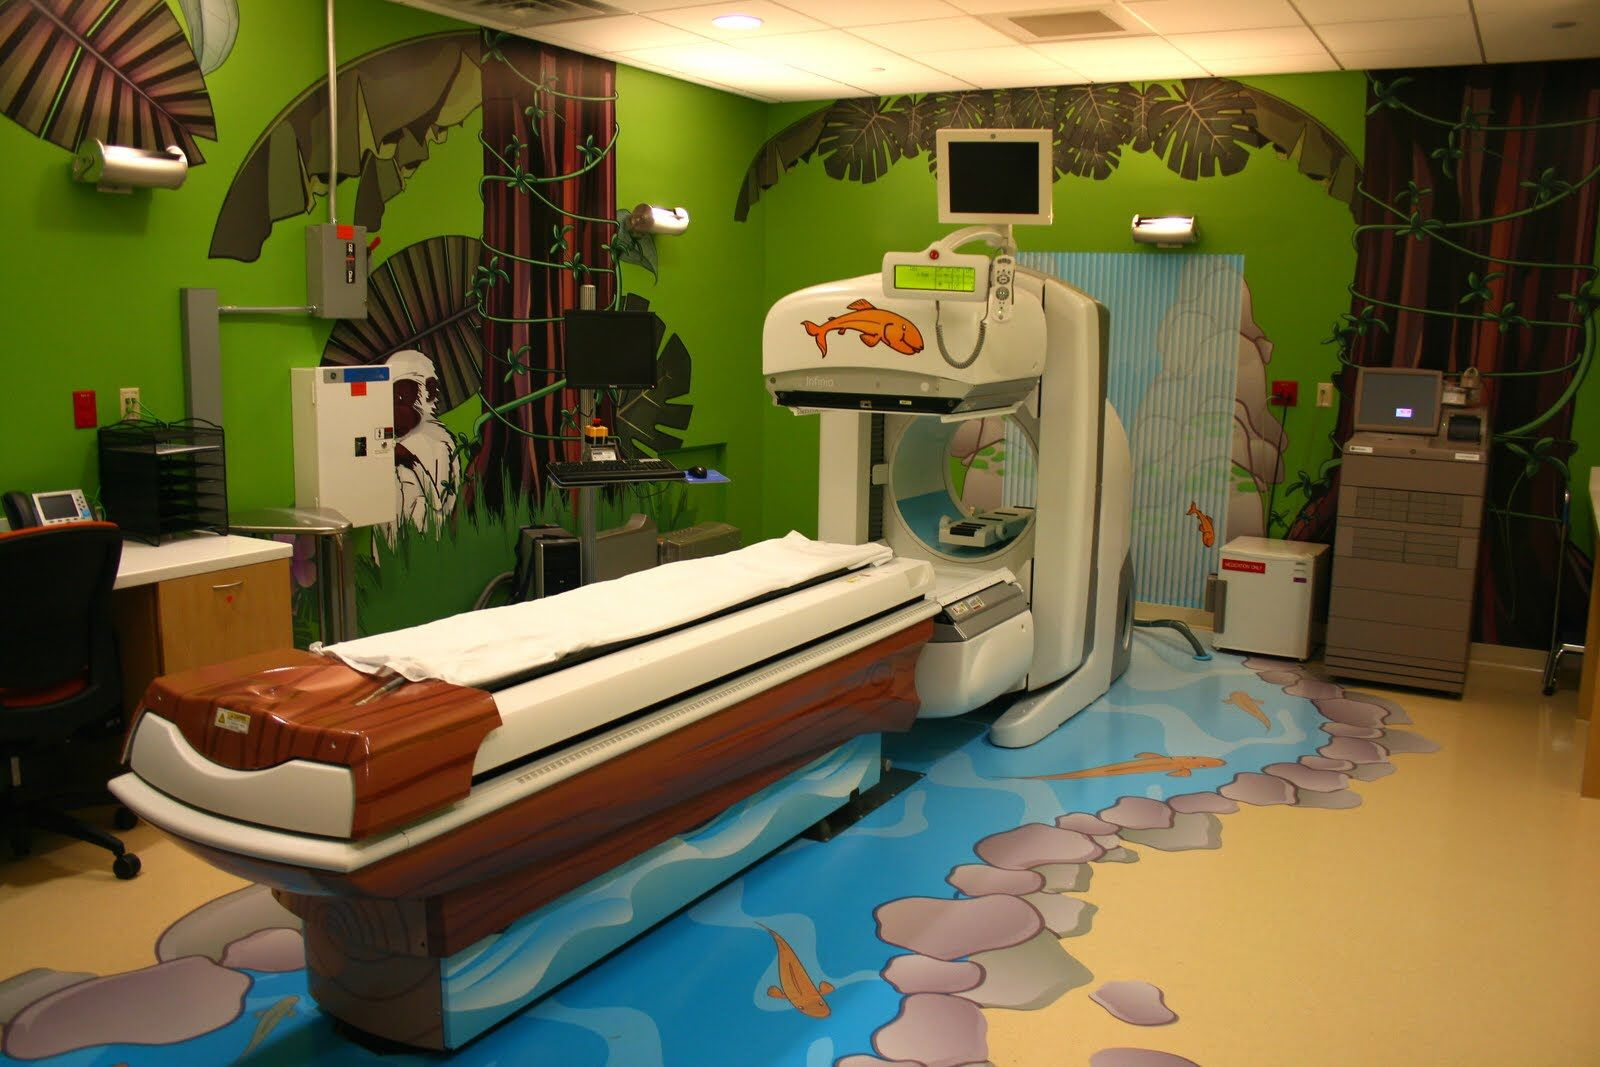 kosair childrens hospital images - HD1600×1067